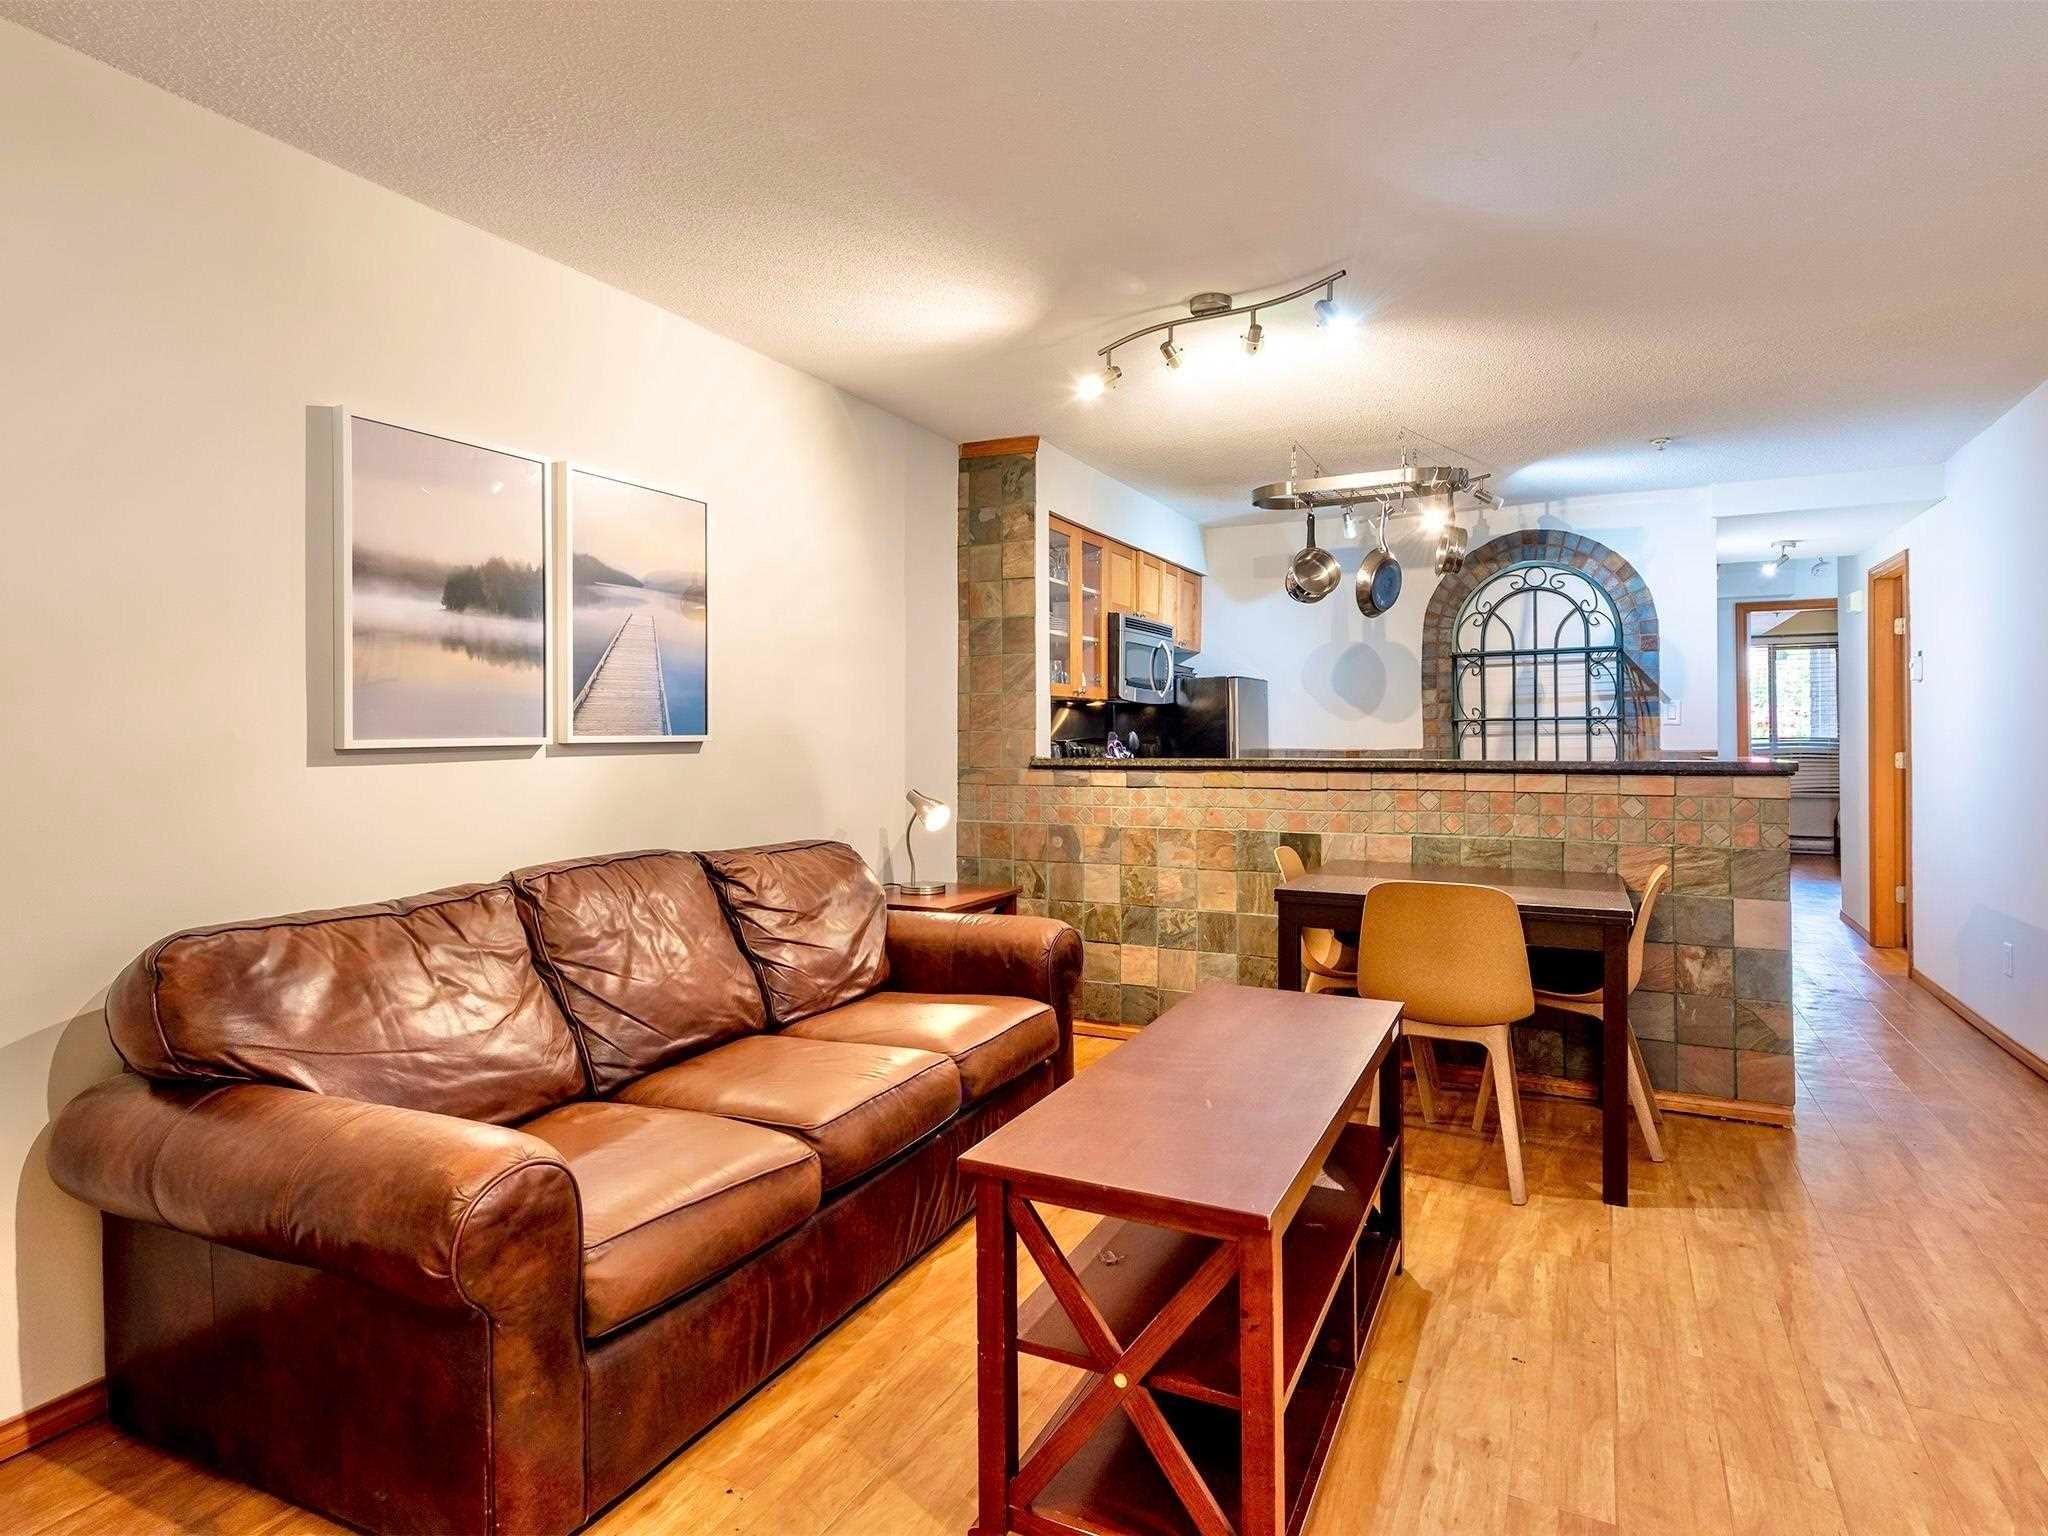 73 4388 NORTHLANDS BOULEVARD - Whistler Village Townhouse for sale, 2 Bedrooms (R2580863) - #3